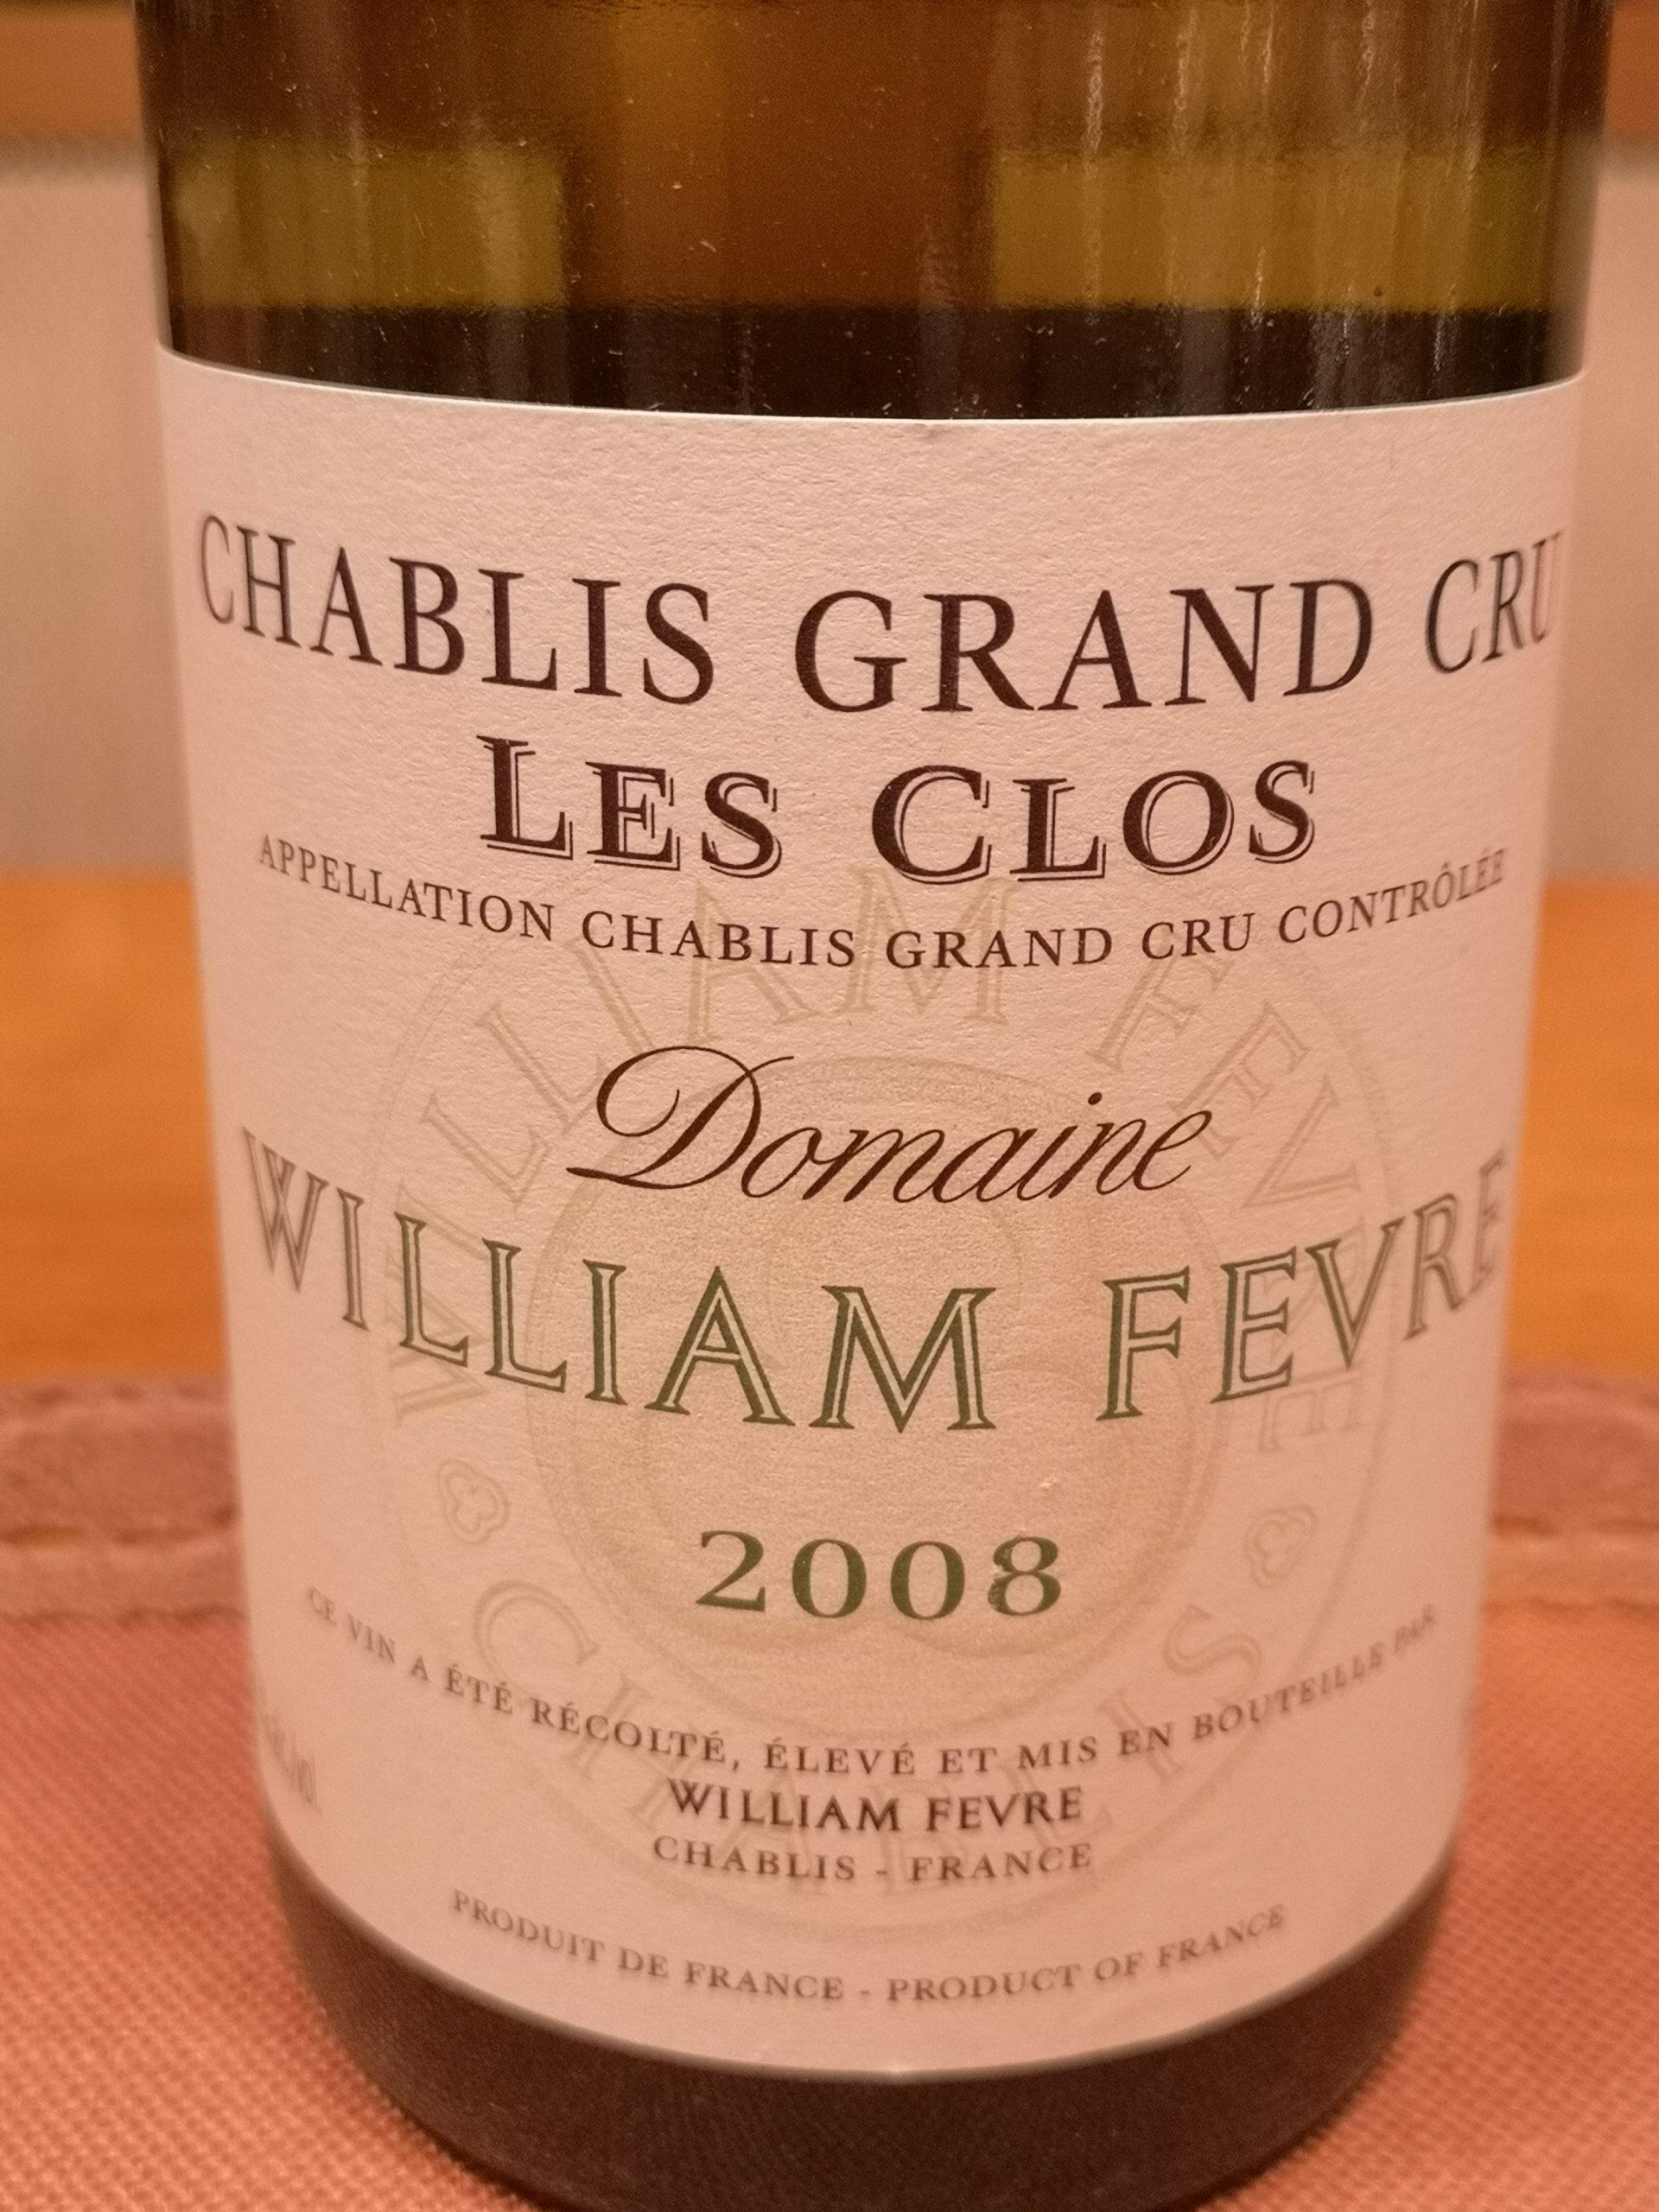 2008 Chablis Les Clos Grand Cru | William Fèvre